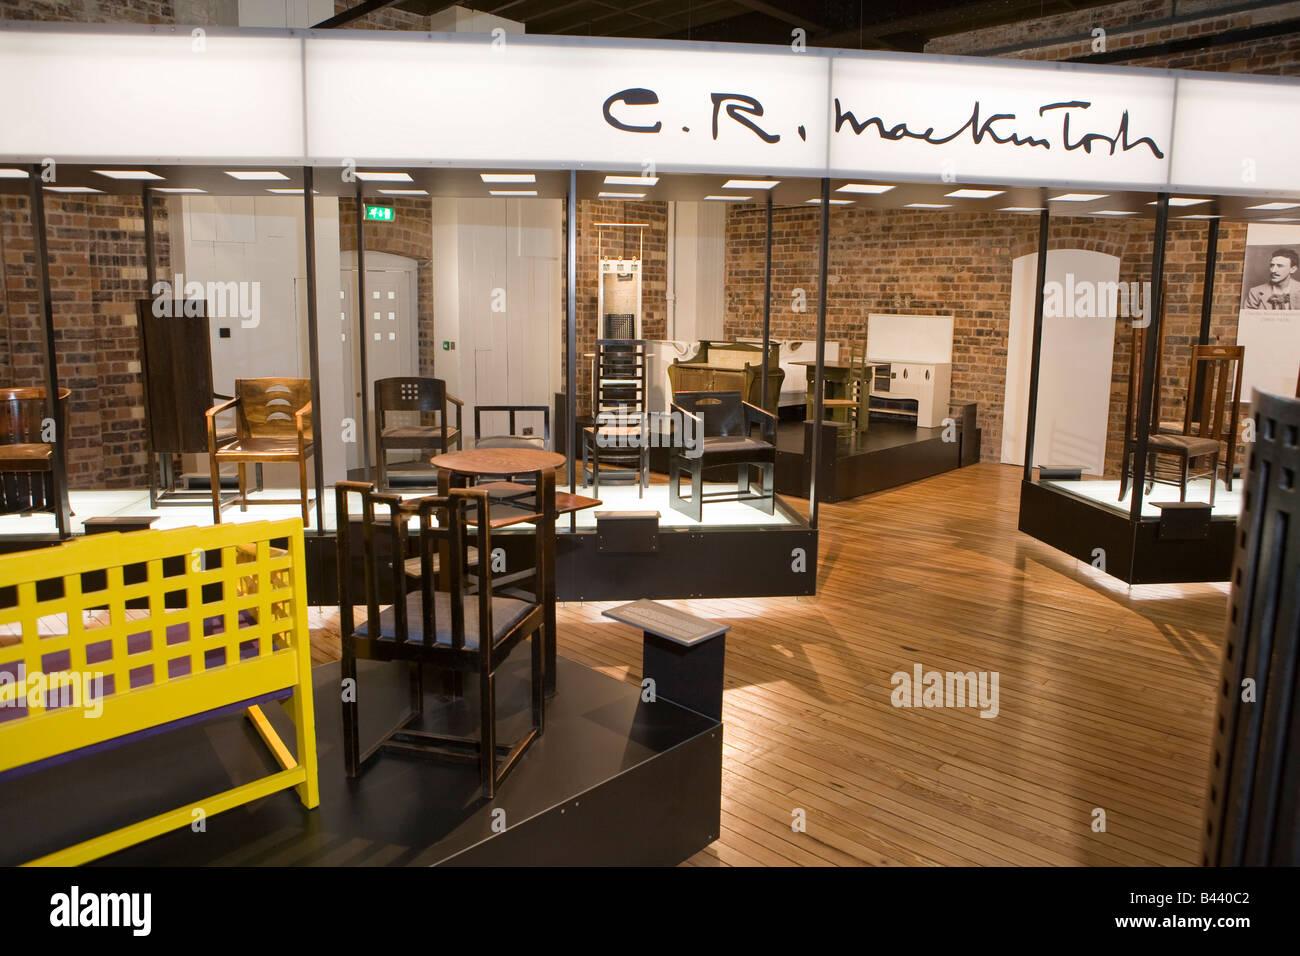 Exhibition Displays Glasgow : Mackintosh chair stockfotos bilder alamy